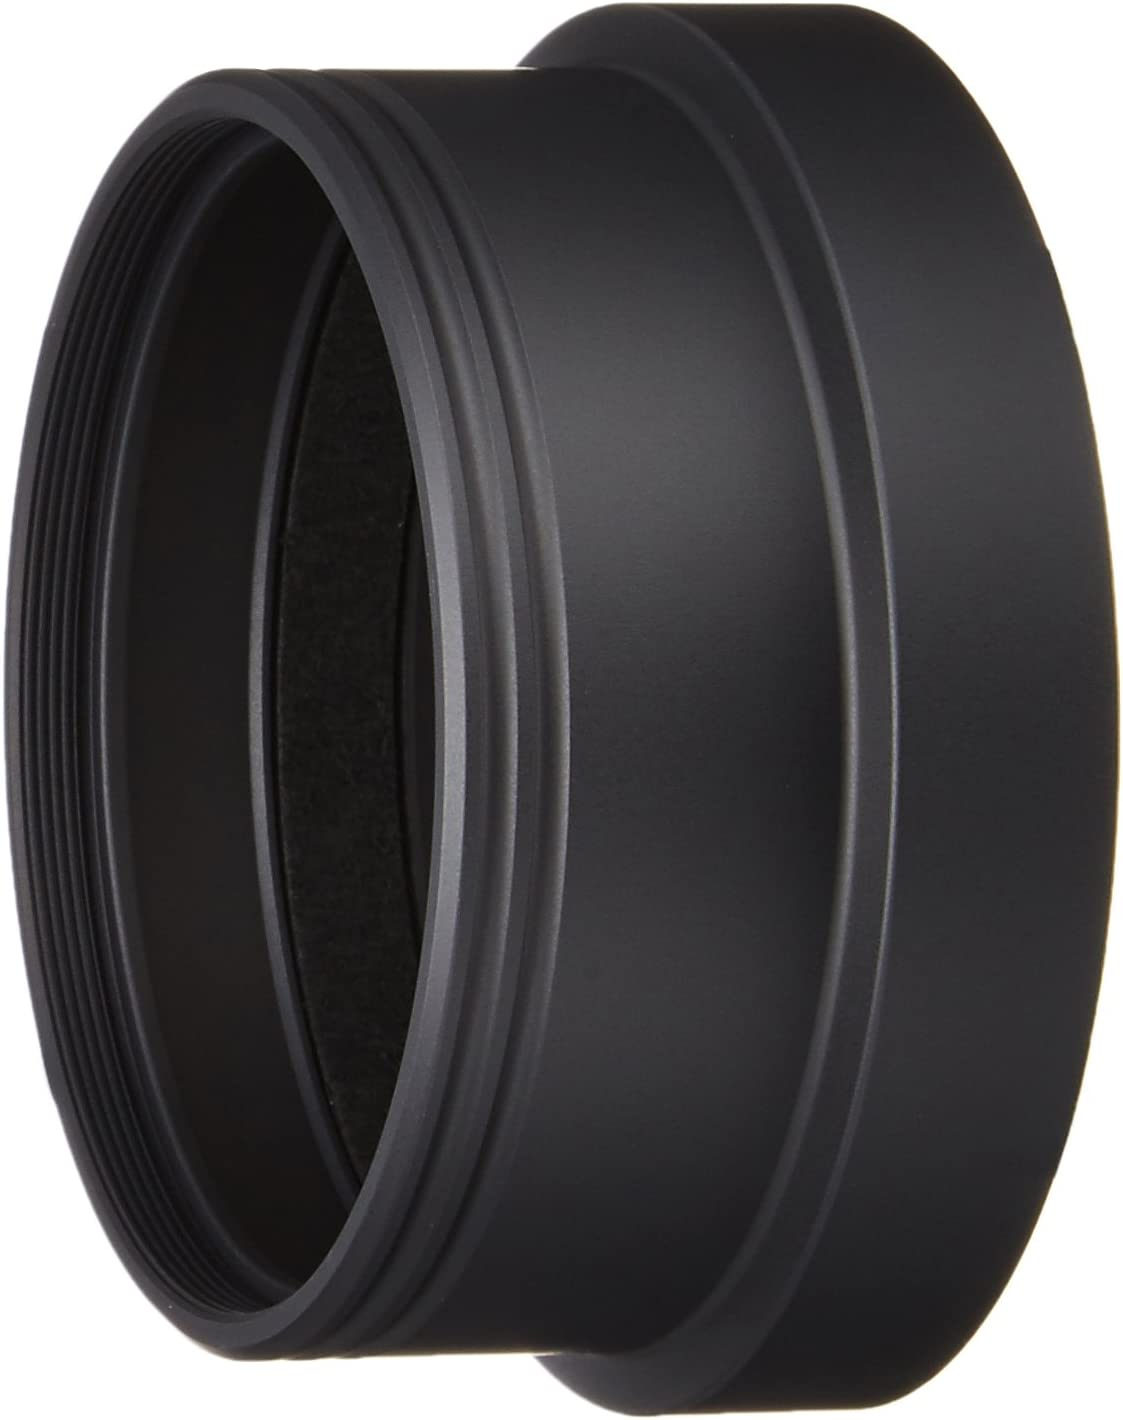 Sigma 10 Mm F2 8 Ex Dc Fisheye Hsm Objektiv Für Canon Kamera